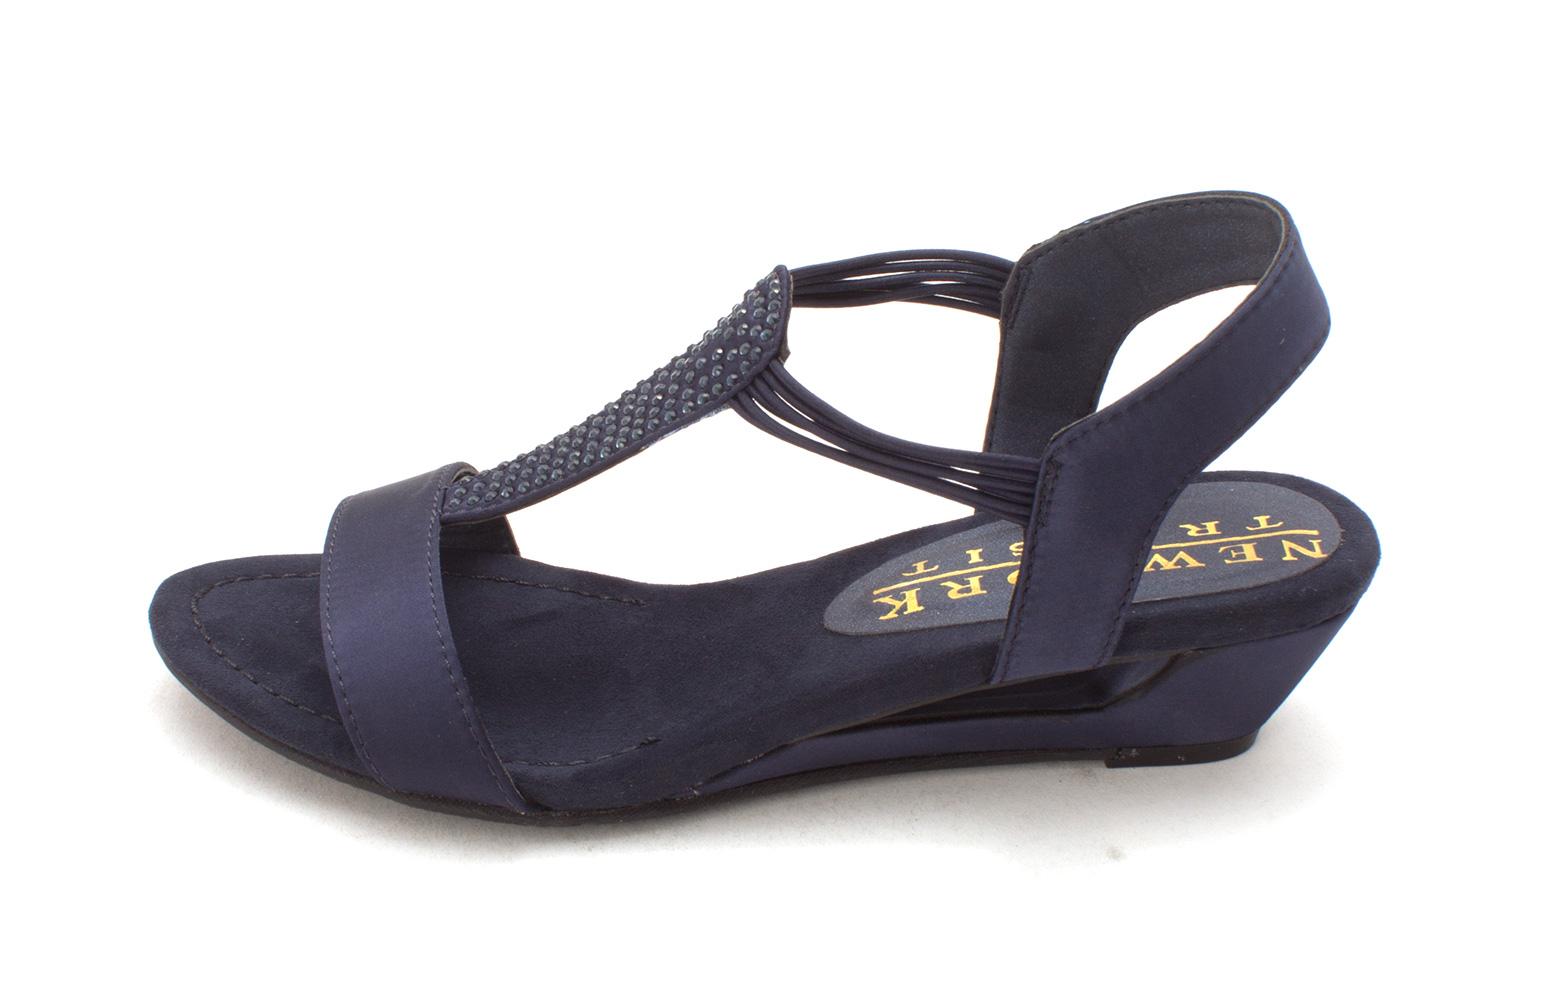 bd1f0741b990e Birkenstock Arizona Sandali Sottile Marrone Sandali Pantofole Scarpe ...